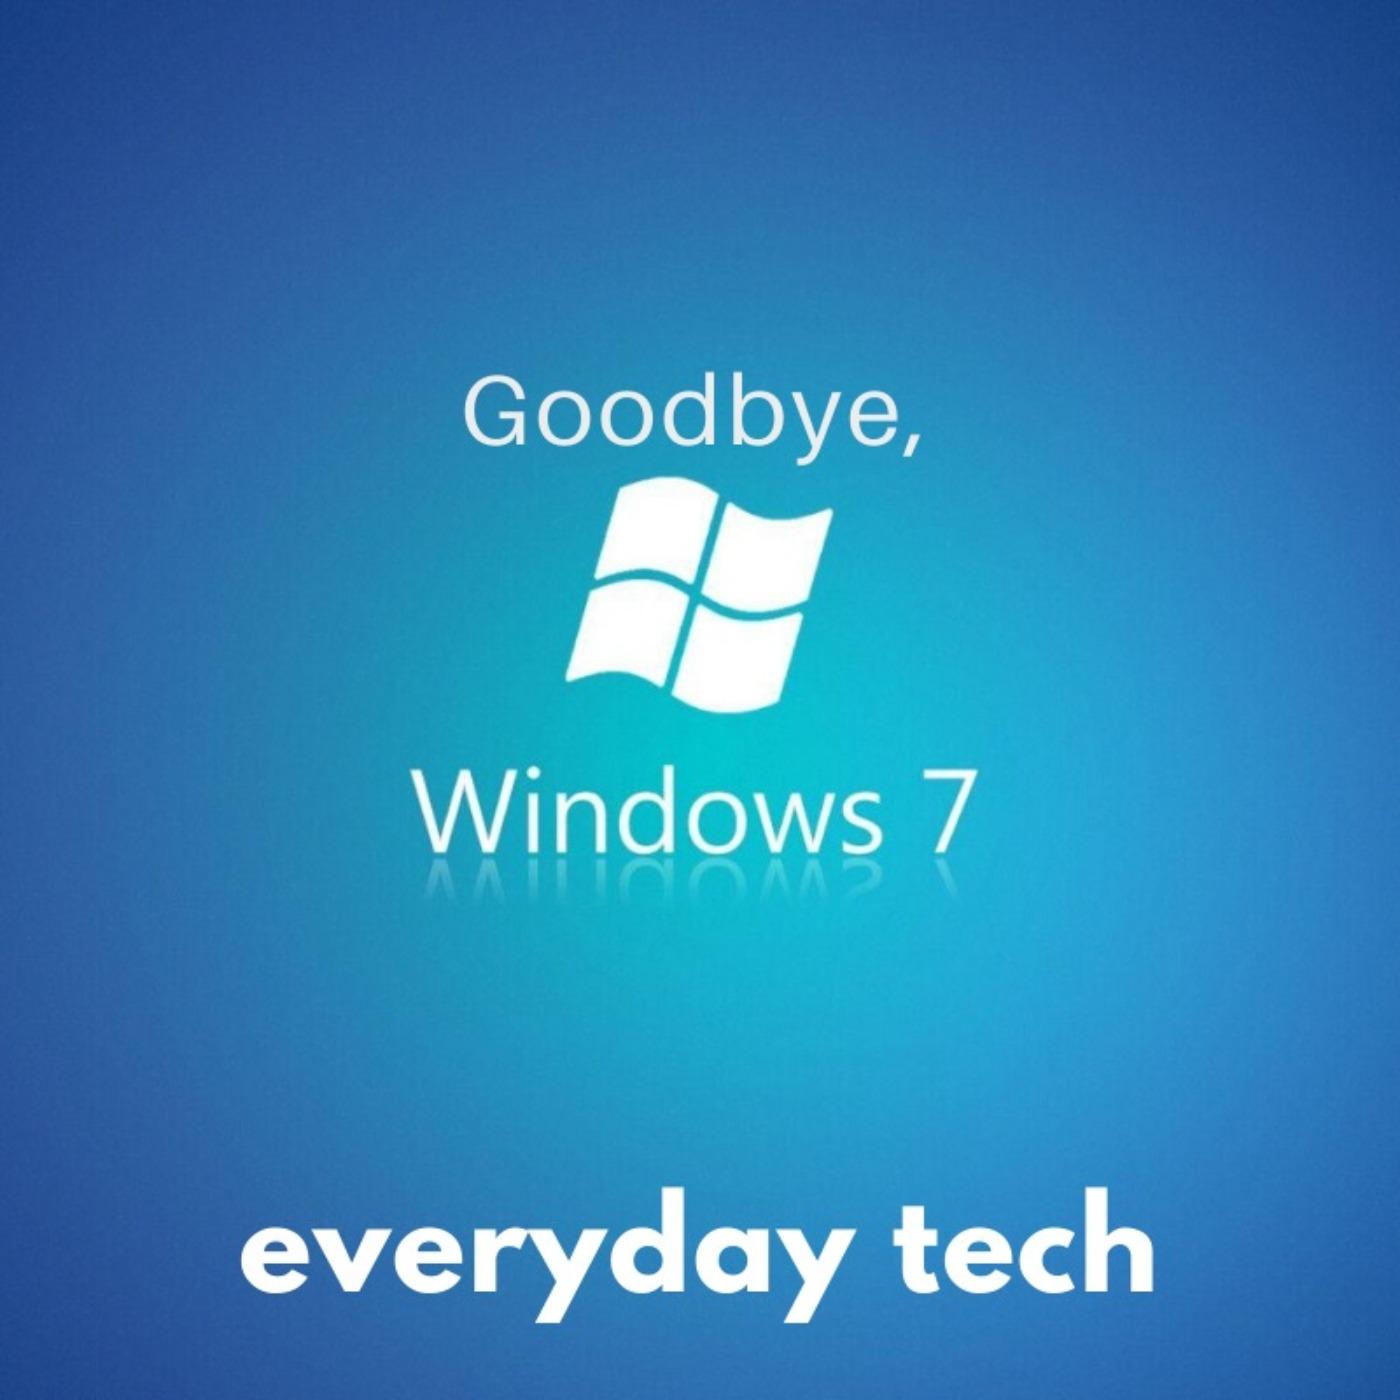 Goodbye, Windows 7